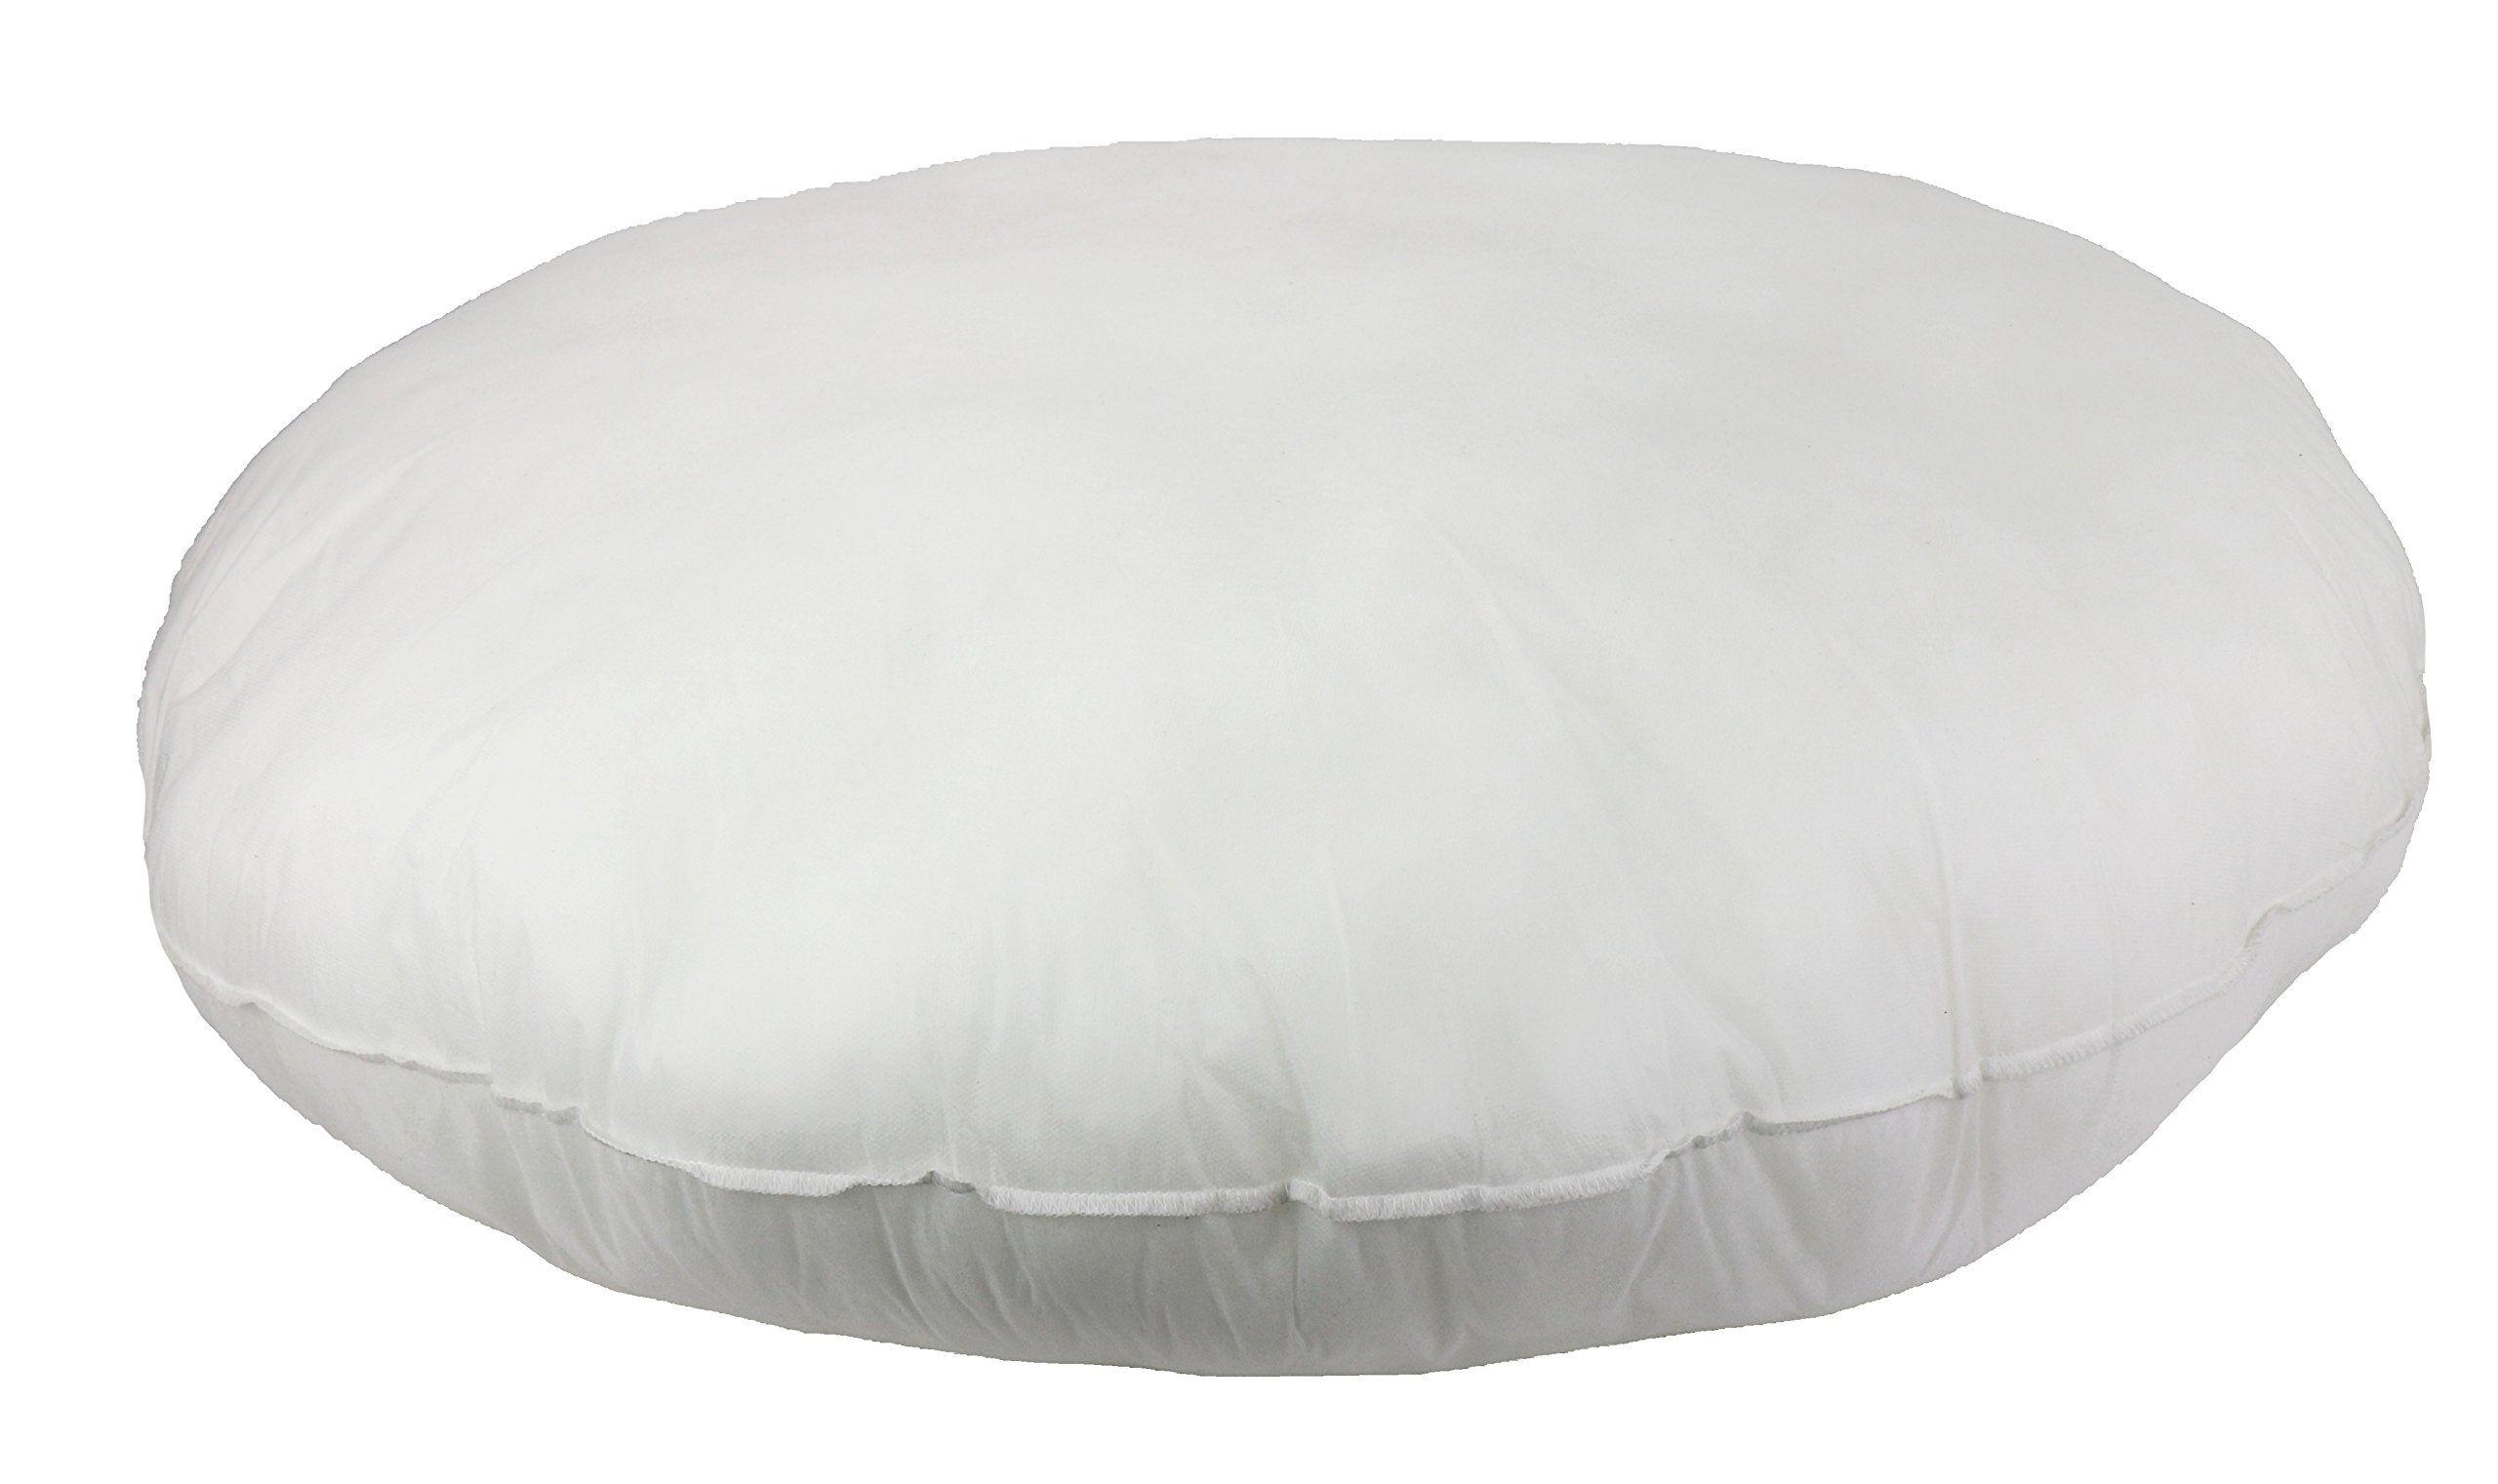 Foamily Premium Hypoallergenic Round Stuffer Pillow Floor